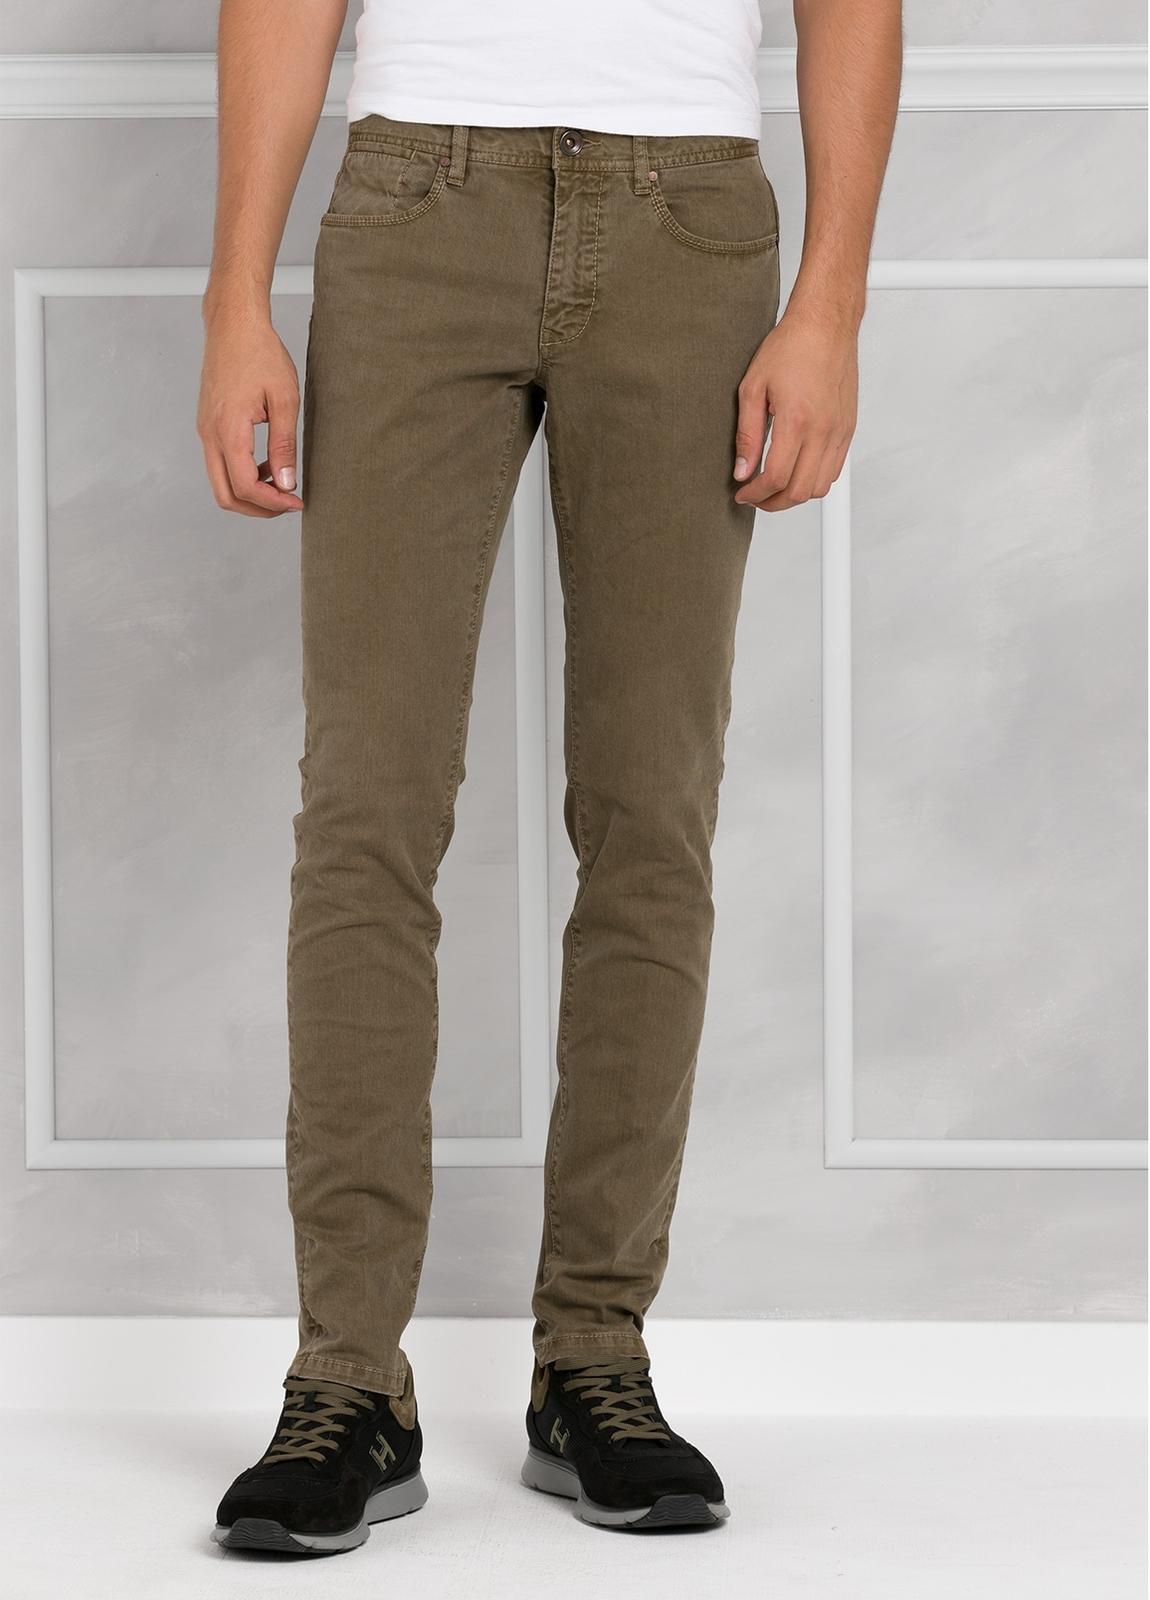 Pantalón 5 bolsillos SLIM FIT modelo FRED 75 color tostado. 97% Algodón 3% Elastán. - Ítem2